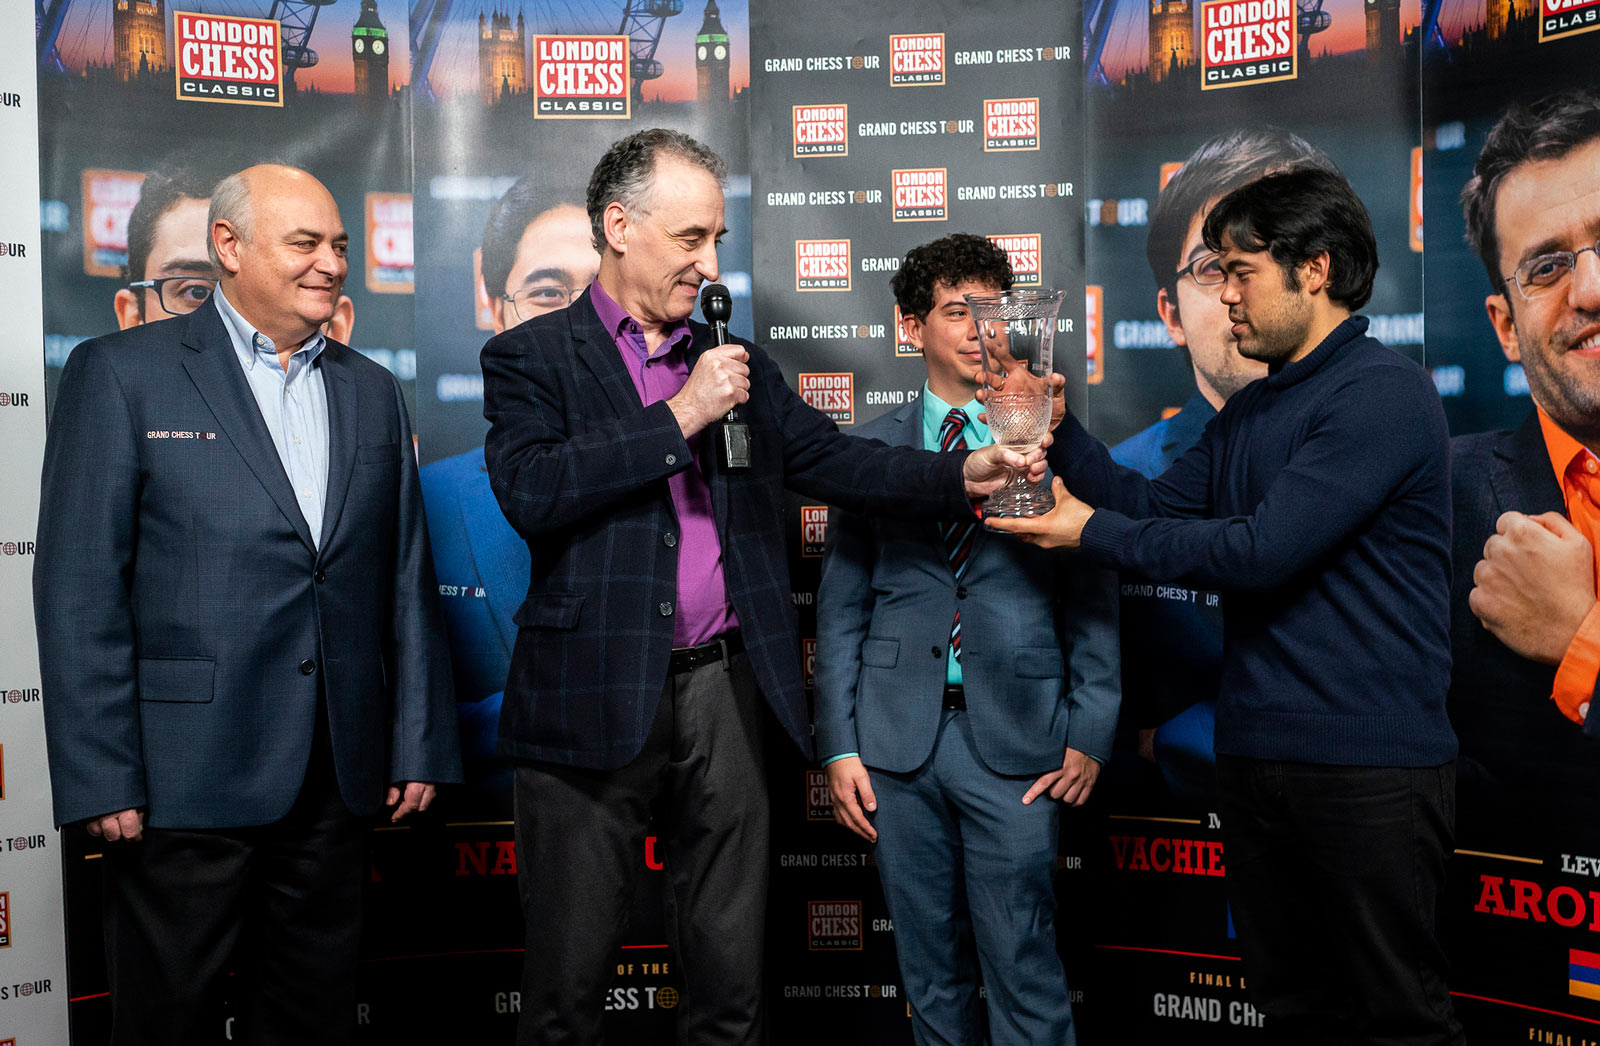 Церемонная награждения победителя турнира London Chess Classic 2018 и Grand Chess Tour 2018